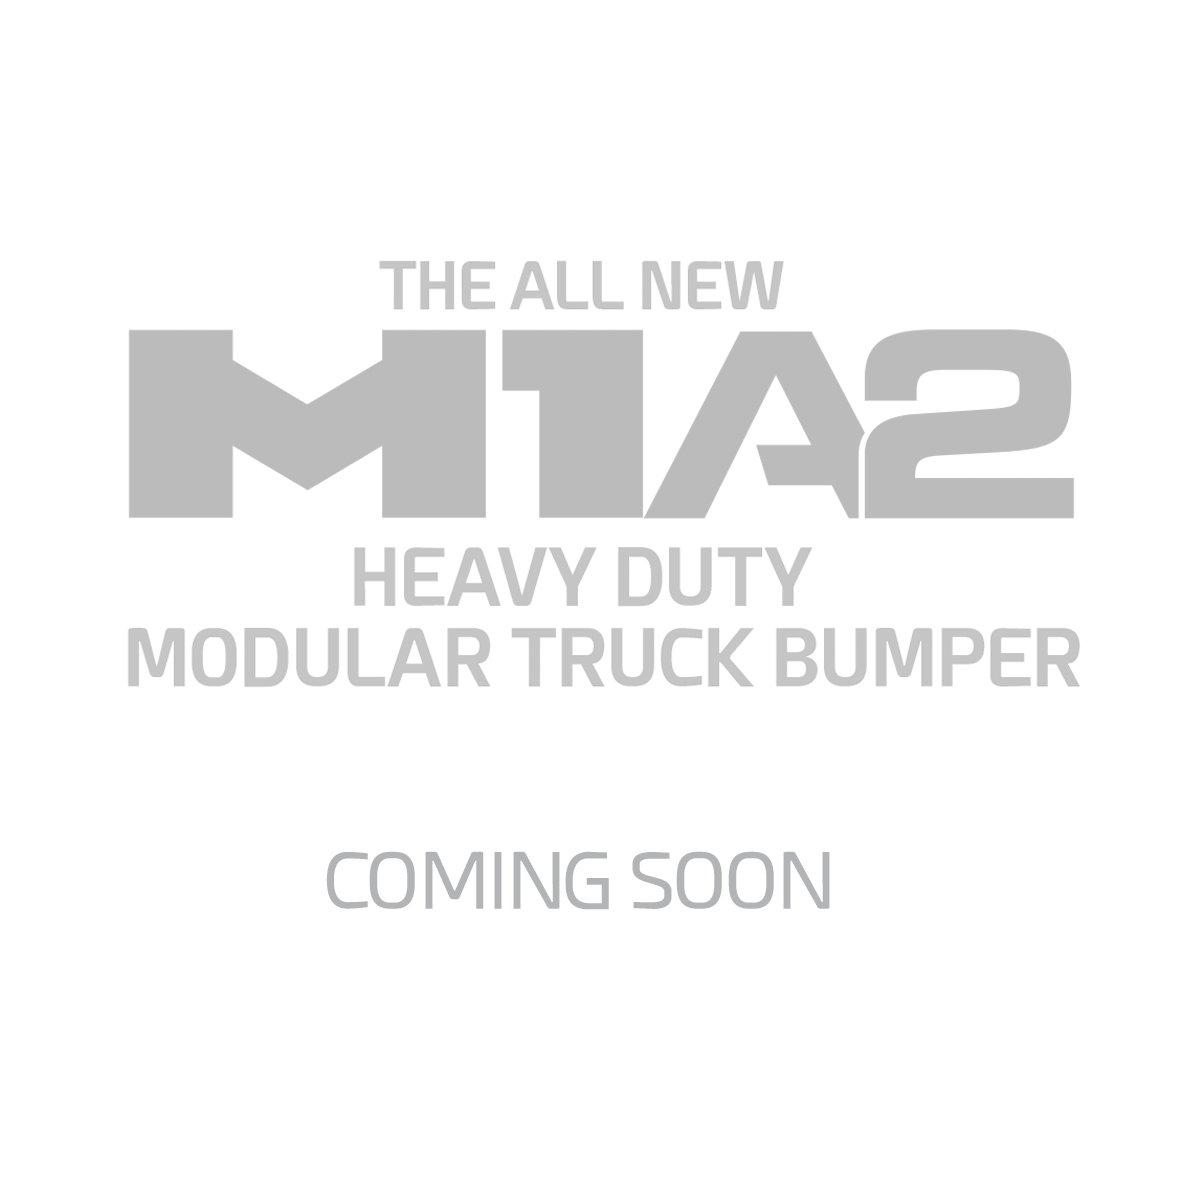 M1A2 FRONT BUMPER